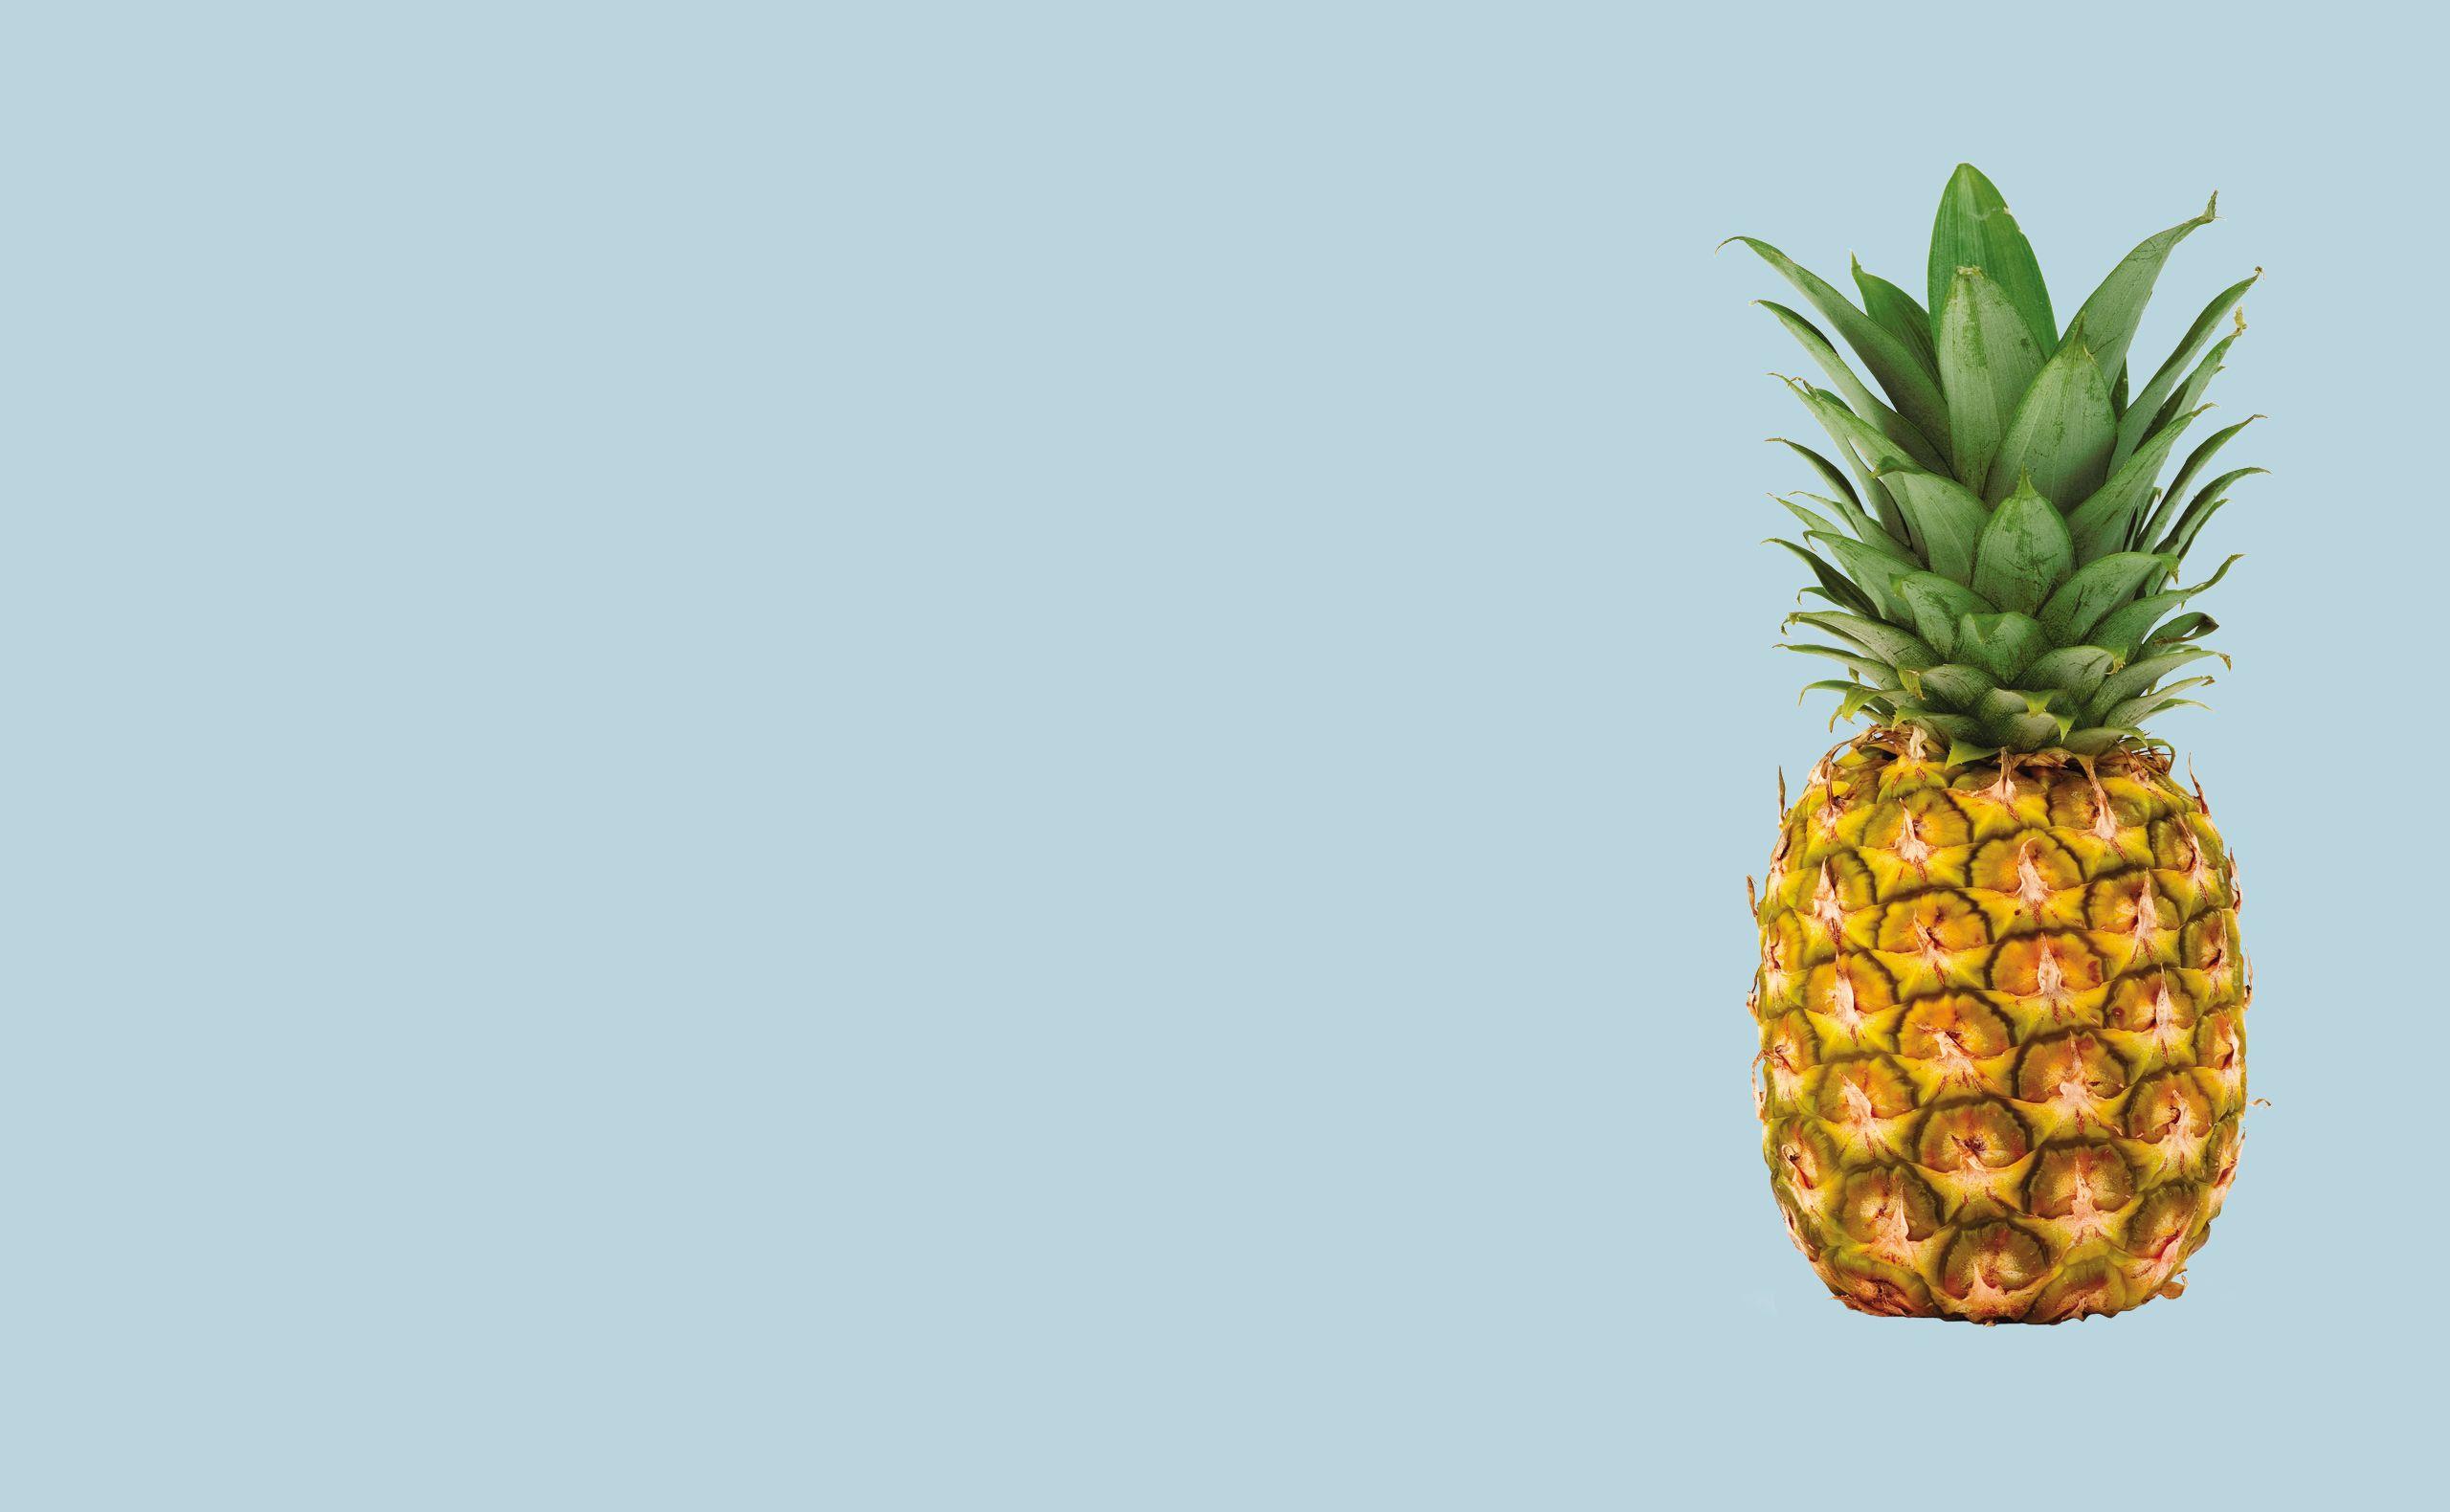 pineapple photography hd